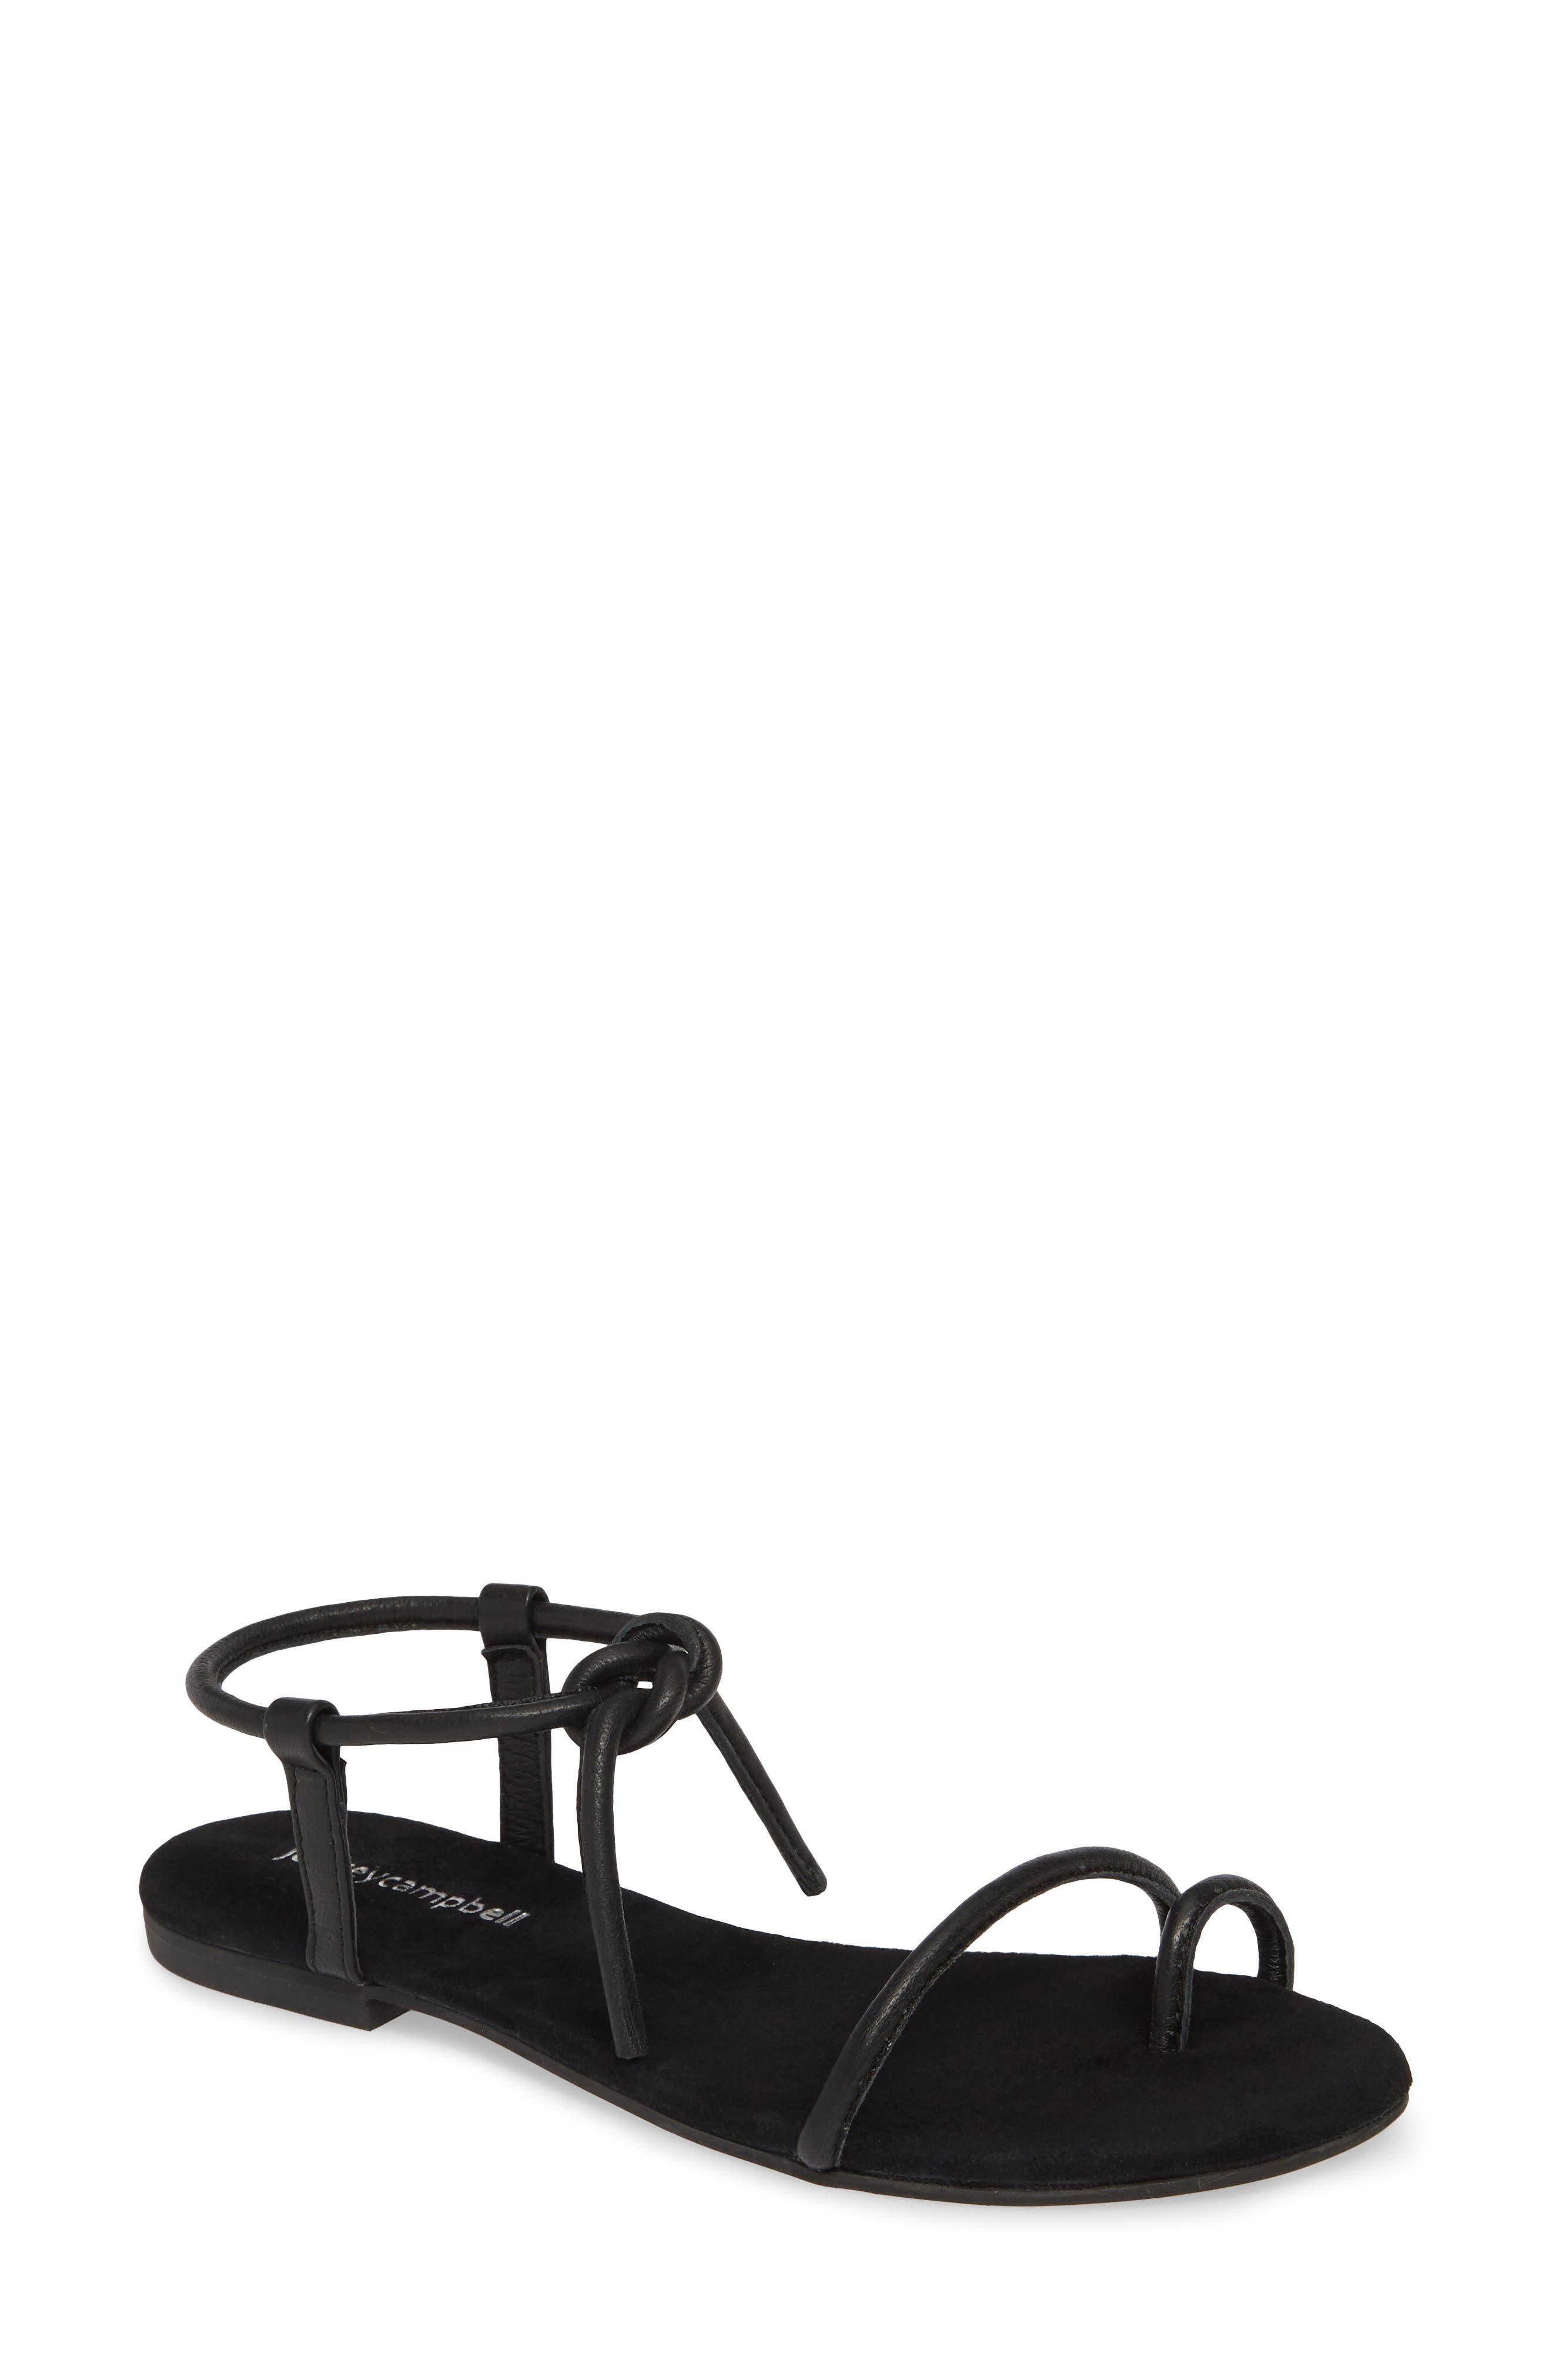 JEFFREY CAMPBELL Aster Tie Sandal, Main, color, BLACK LEATHER